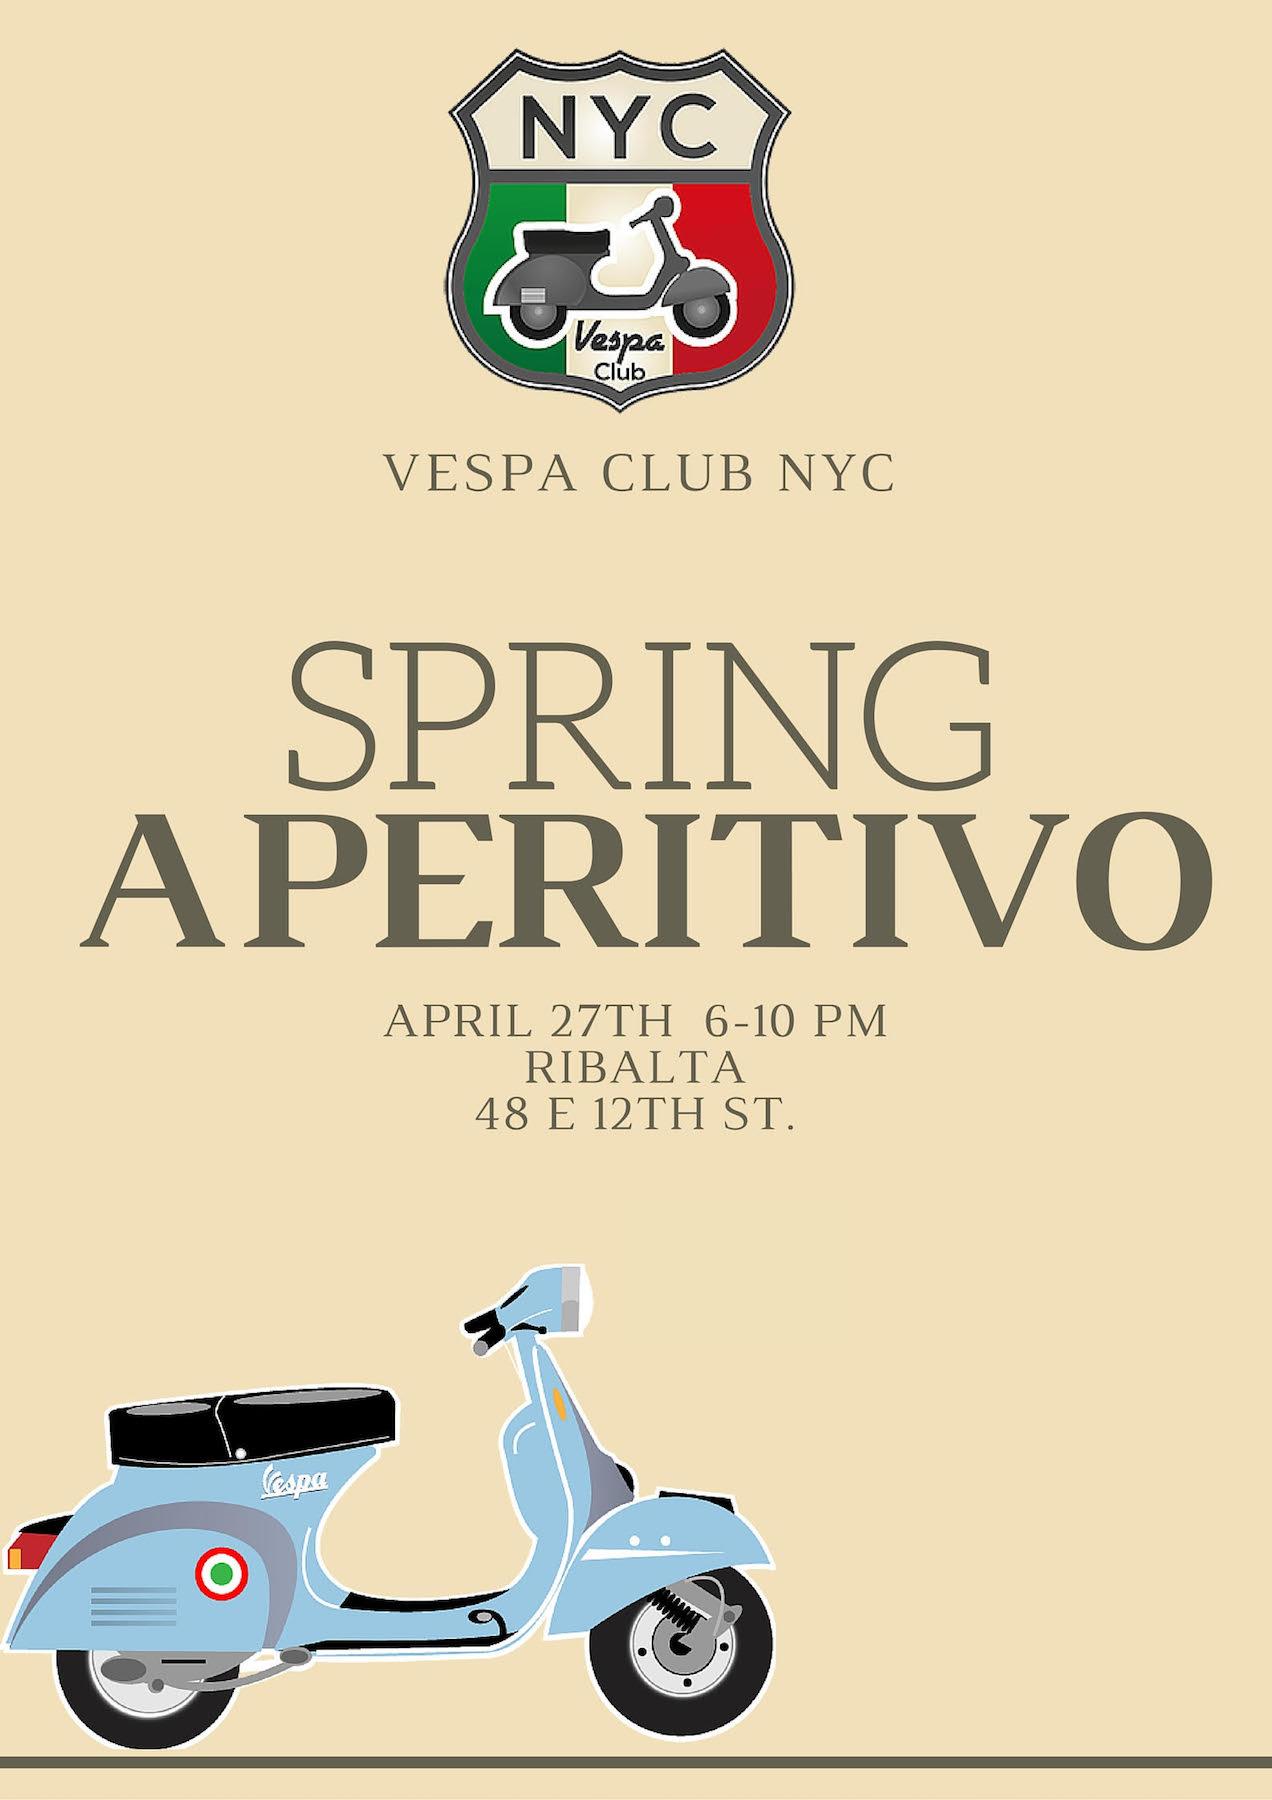 Vespa Club NYC Aperitivo at Ribalta on April 27